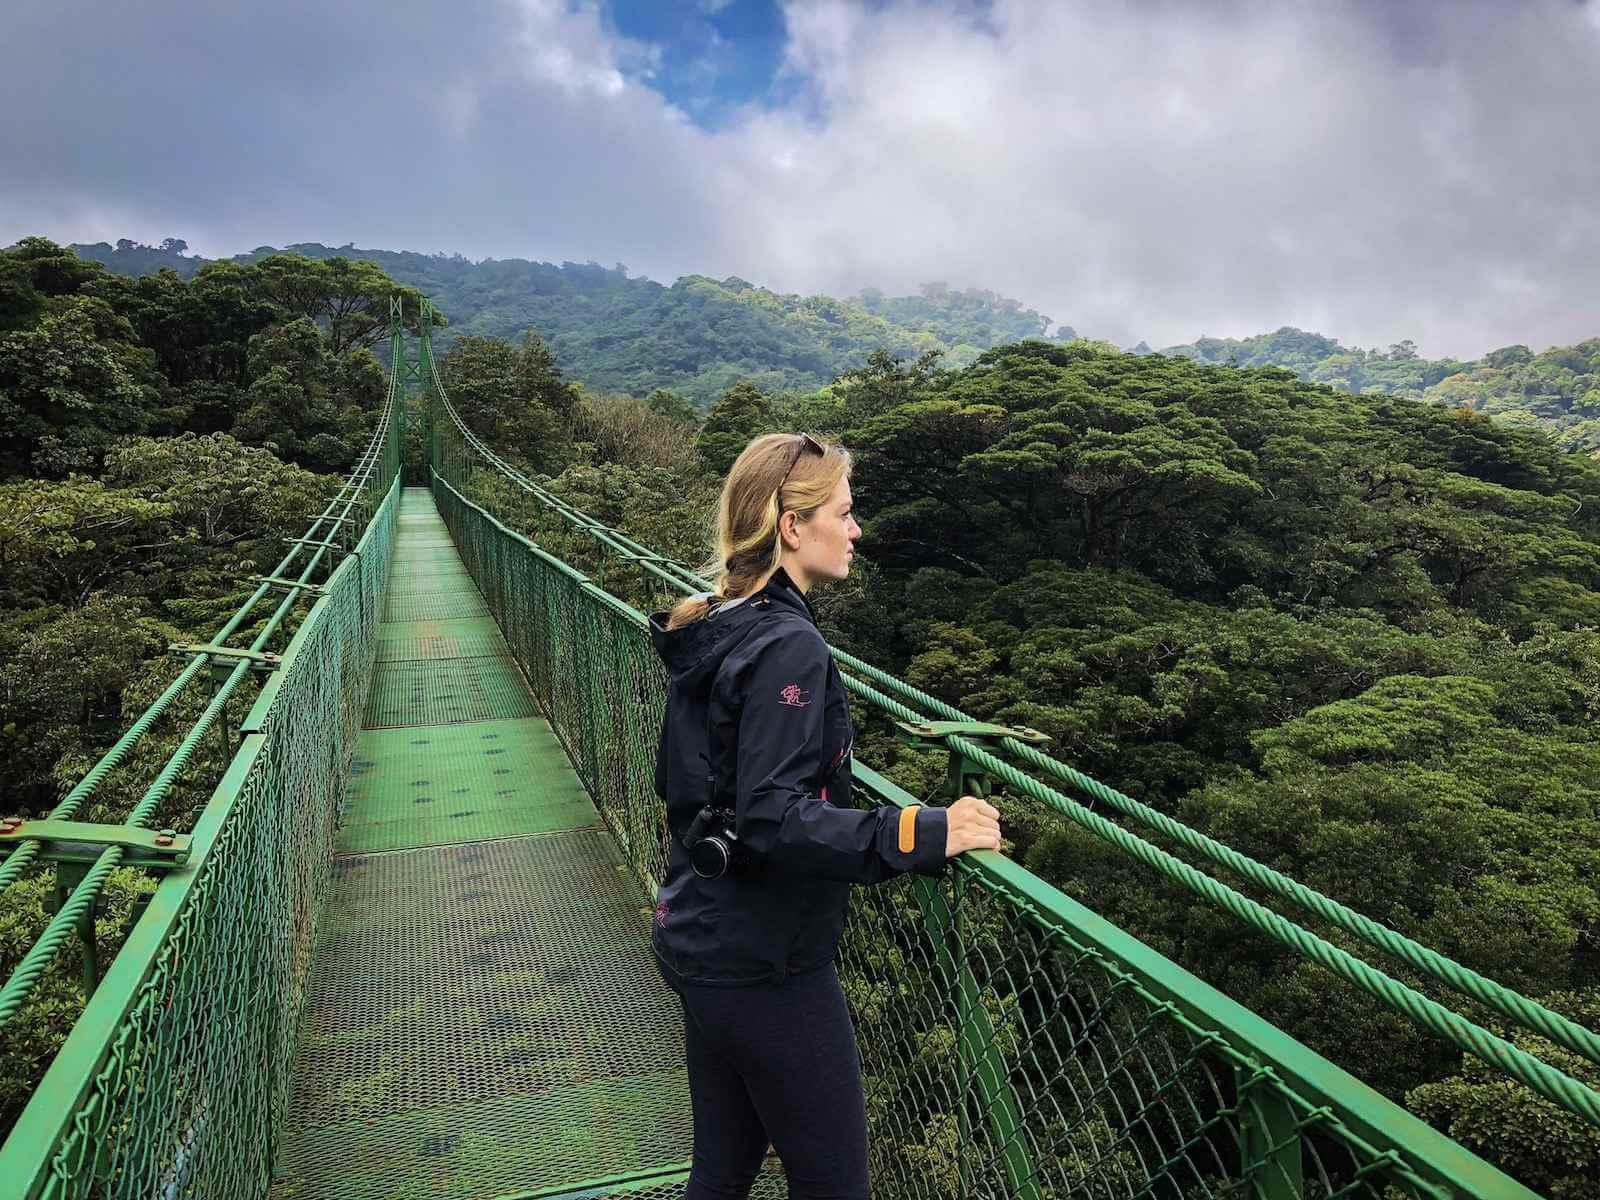 monteverde selvatura park